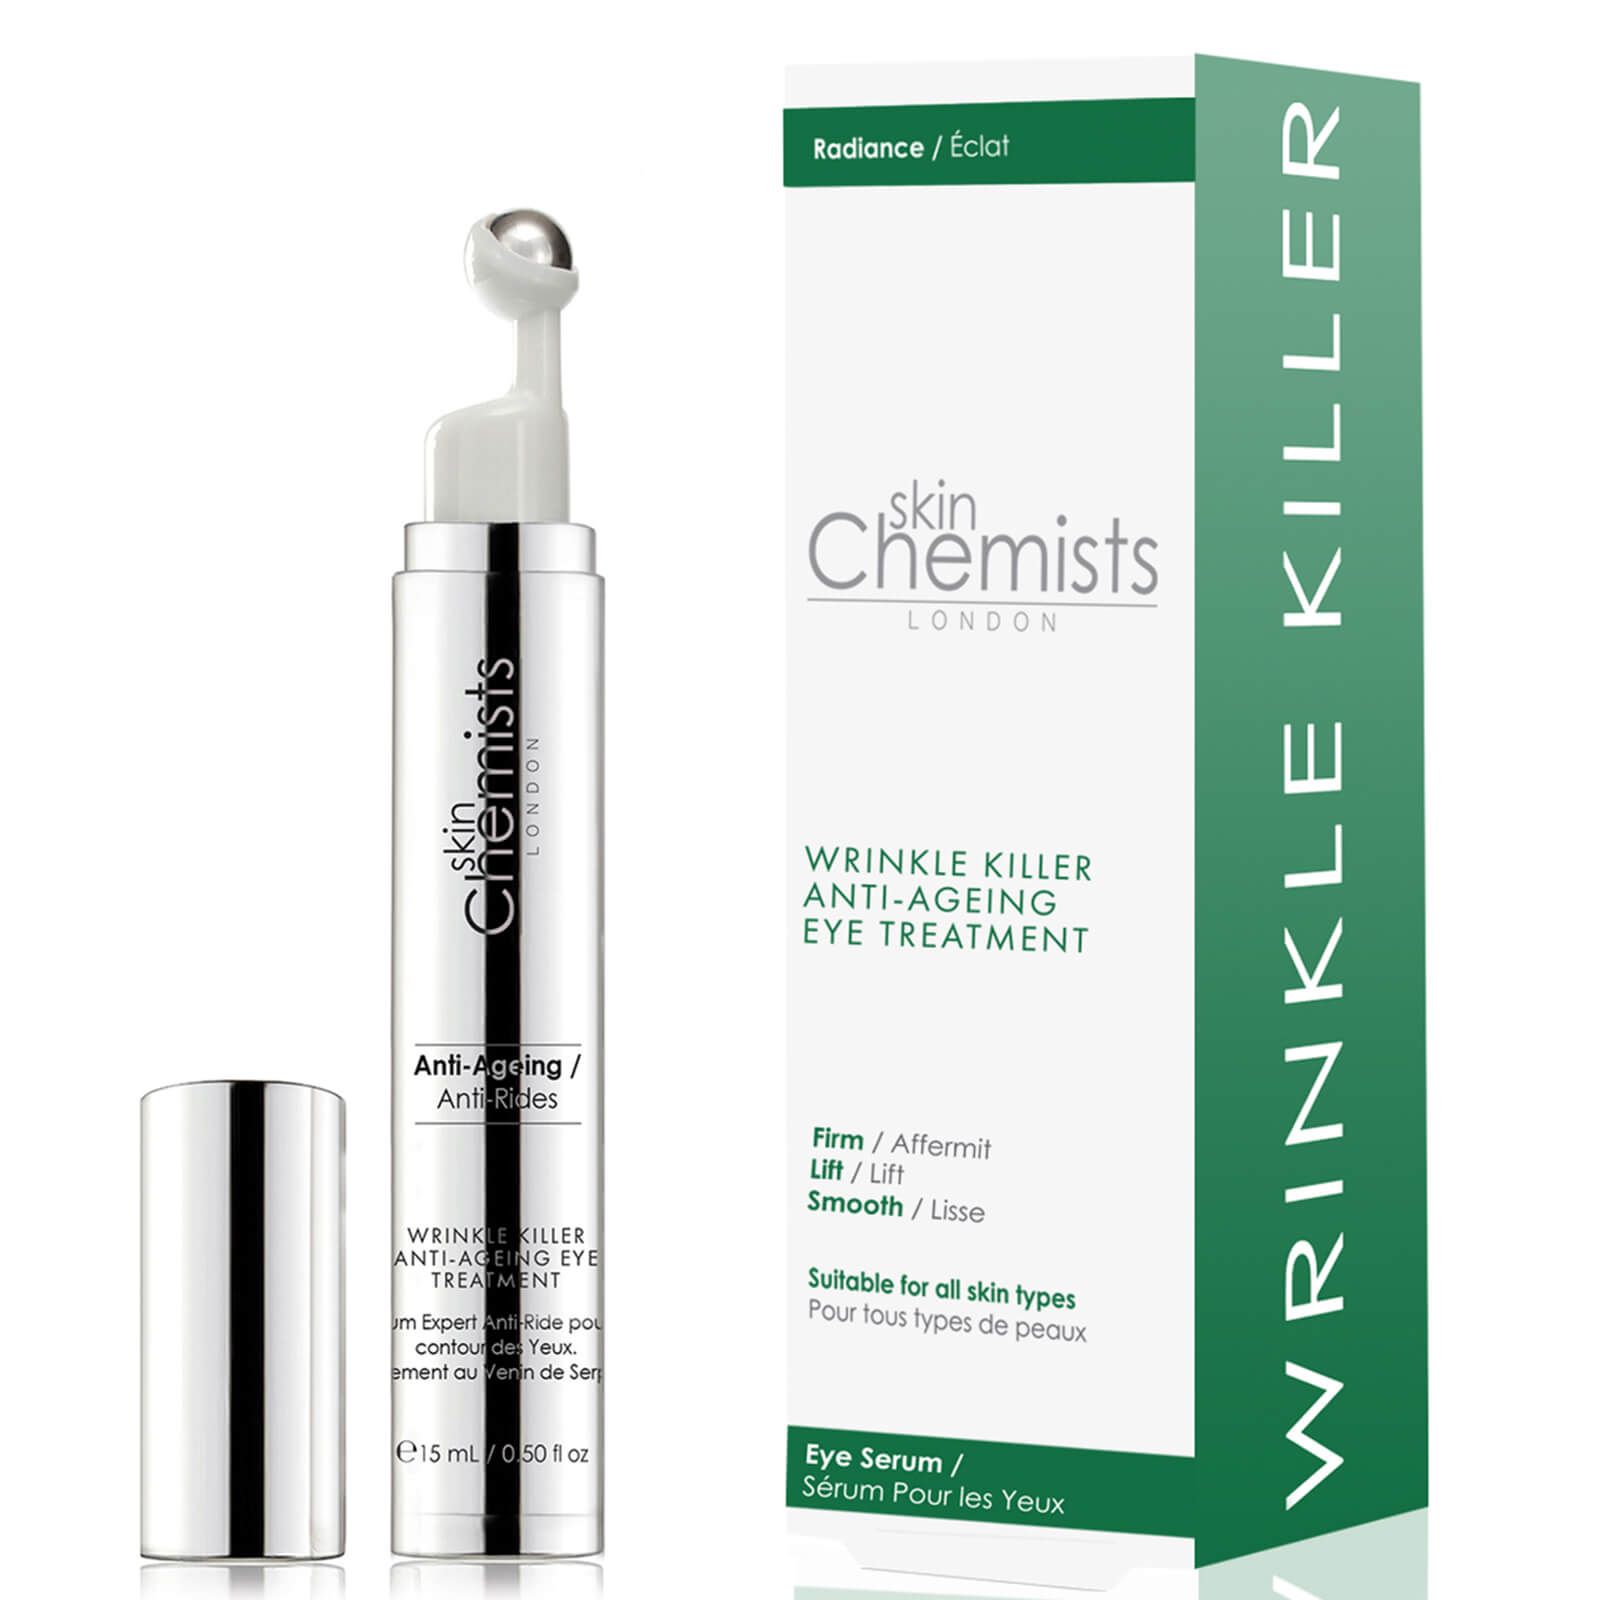 Купить Антивозрастная сыворотка против морщин для кожи вокруг глаз skinChemists London Wrinkle Killer Anti-Ageing Eye Treatment 15мл